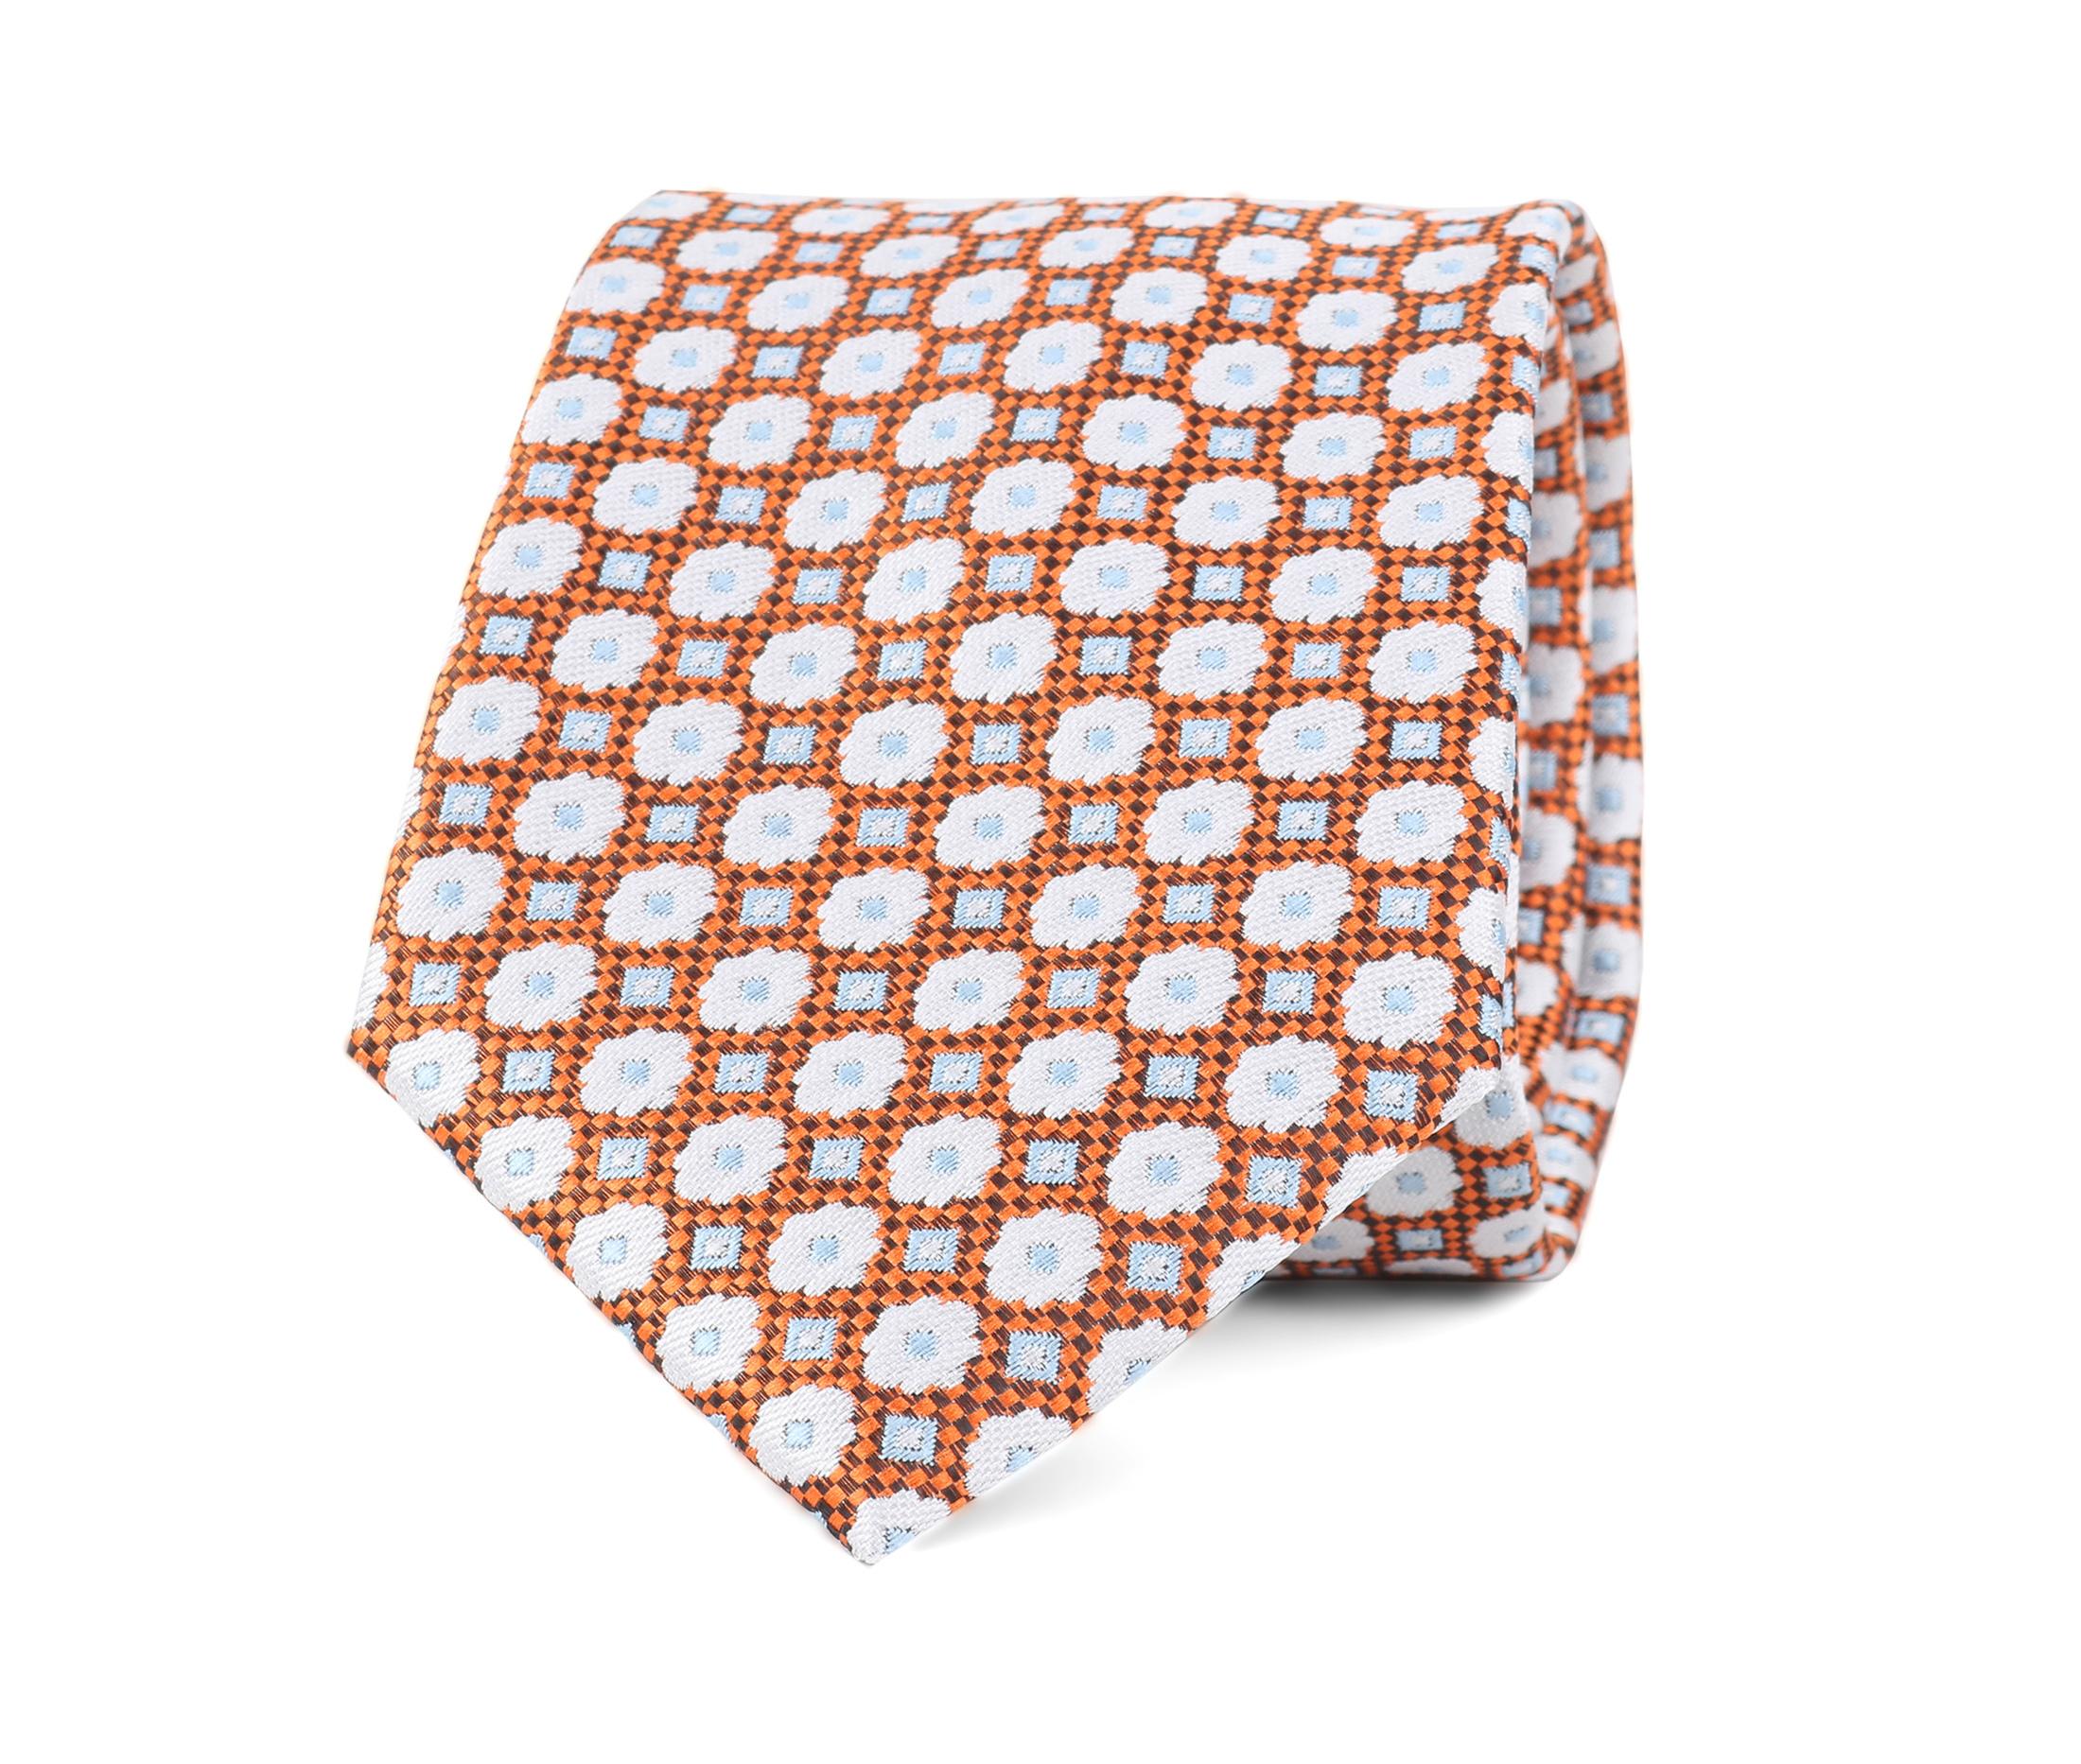 Krawatte Seide Blume Orange 9-17 foto 0